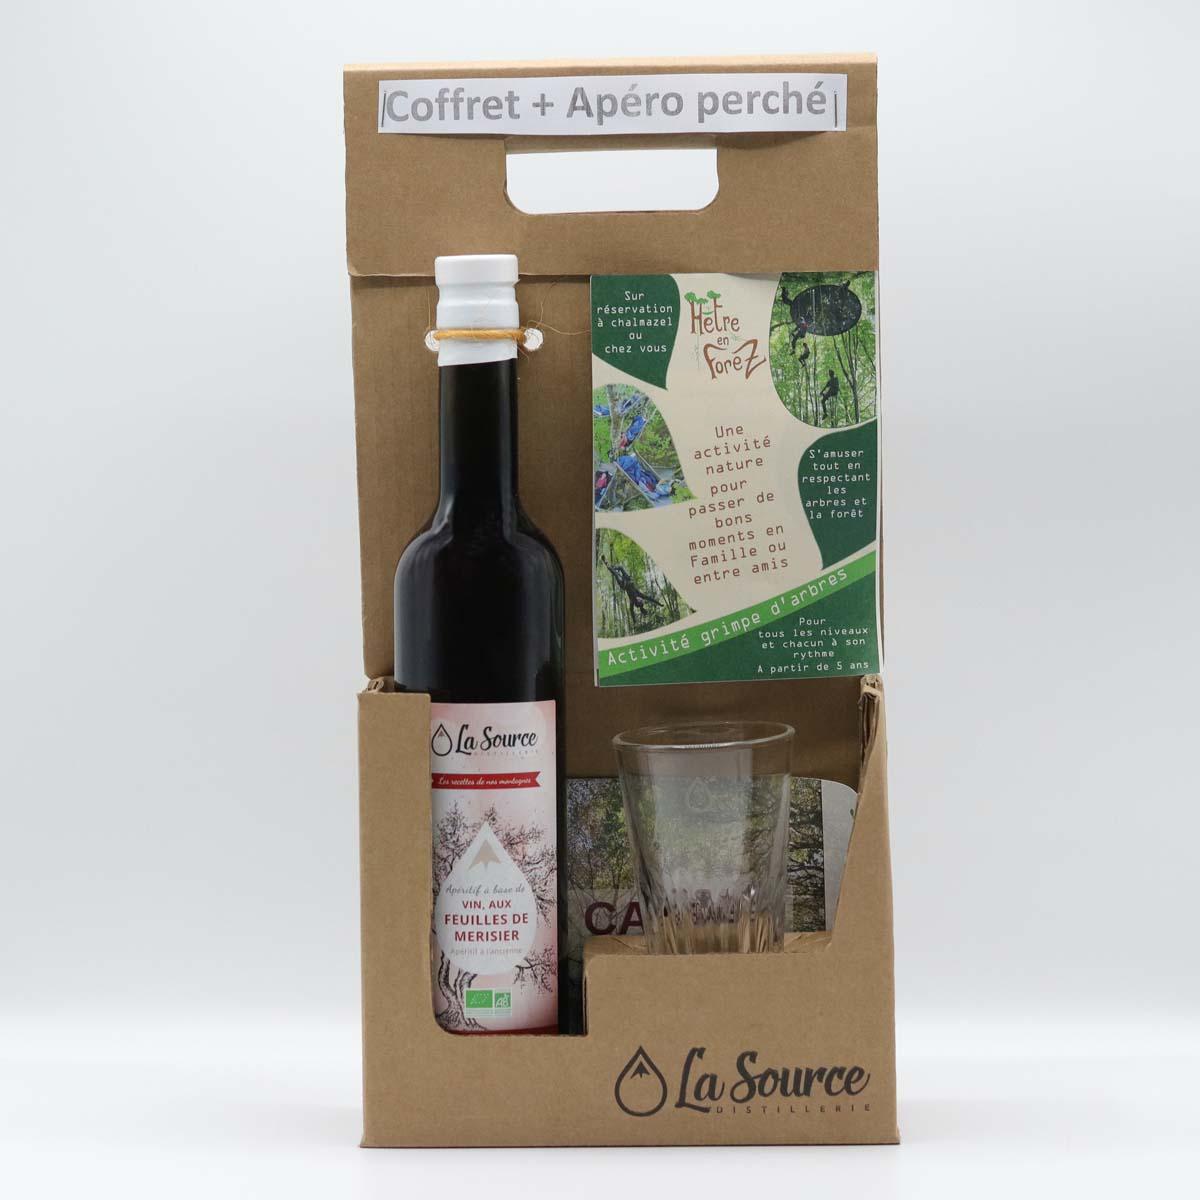 https://www.lasource-distillerie.fr/wp-content/uploads/2021/10/coffret-apero-perche-vin-de-merisier.jpg